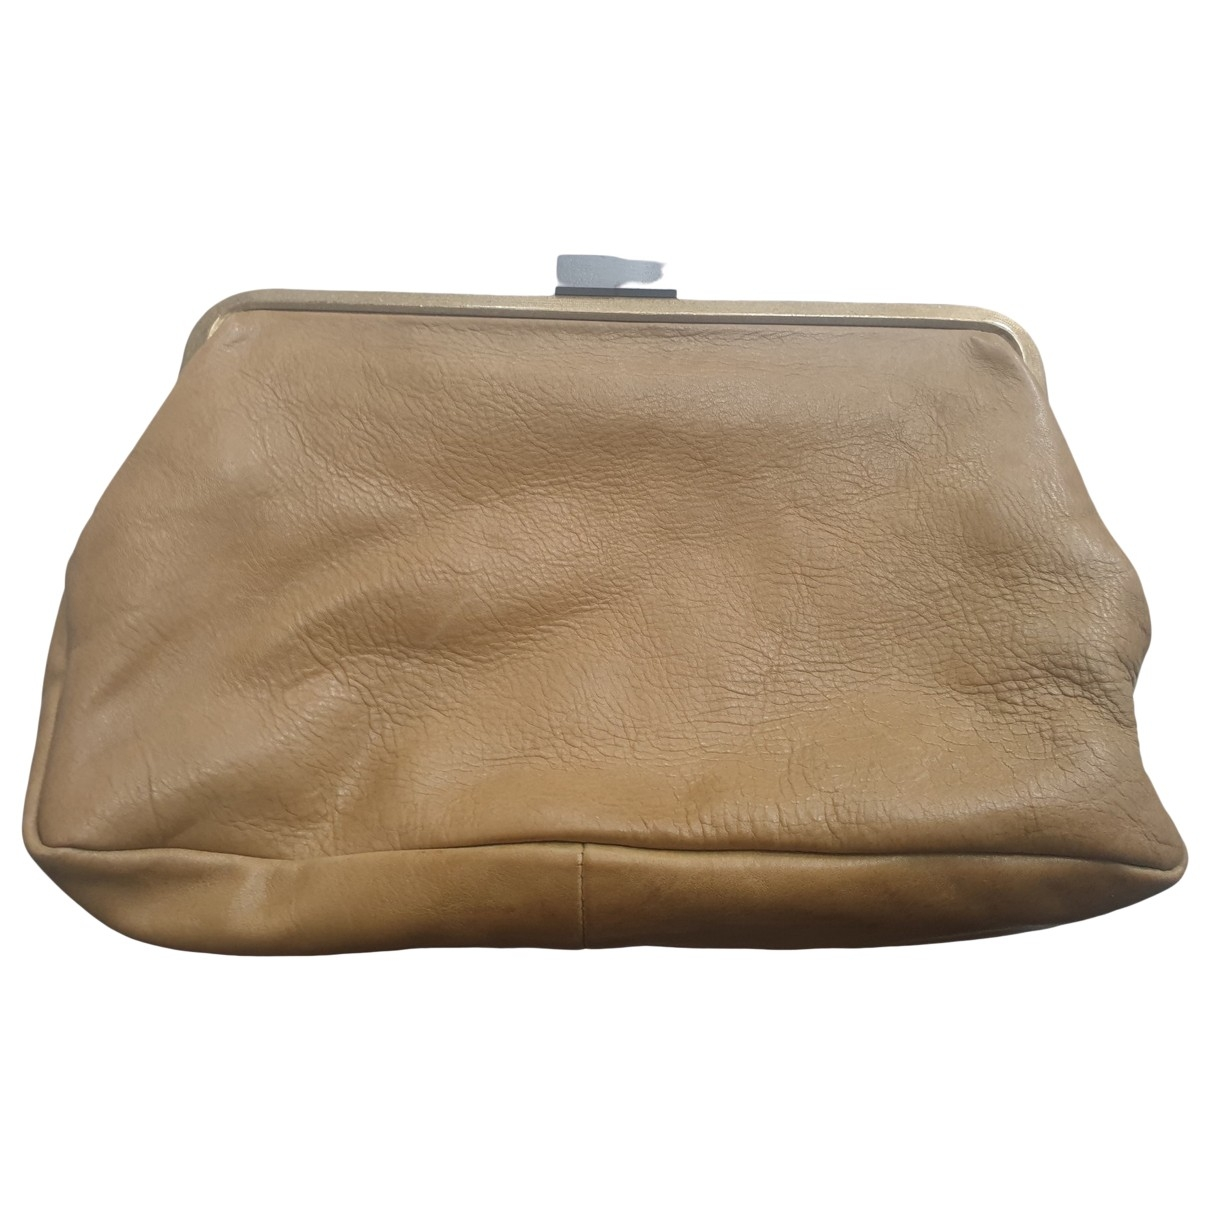 Ally Capellino \N Leather Clutch bag for Women \N